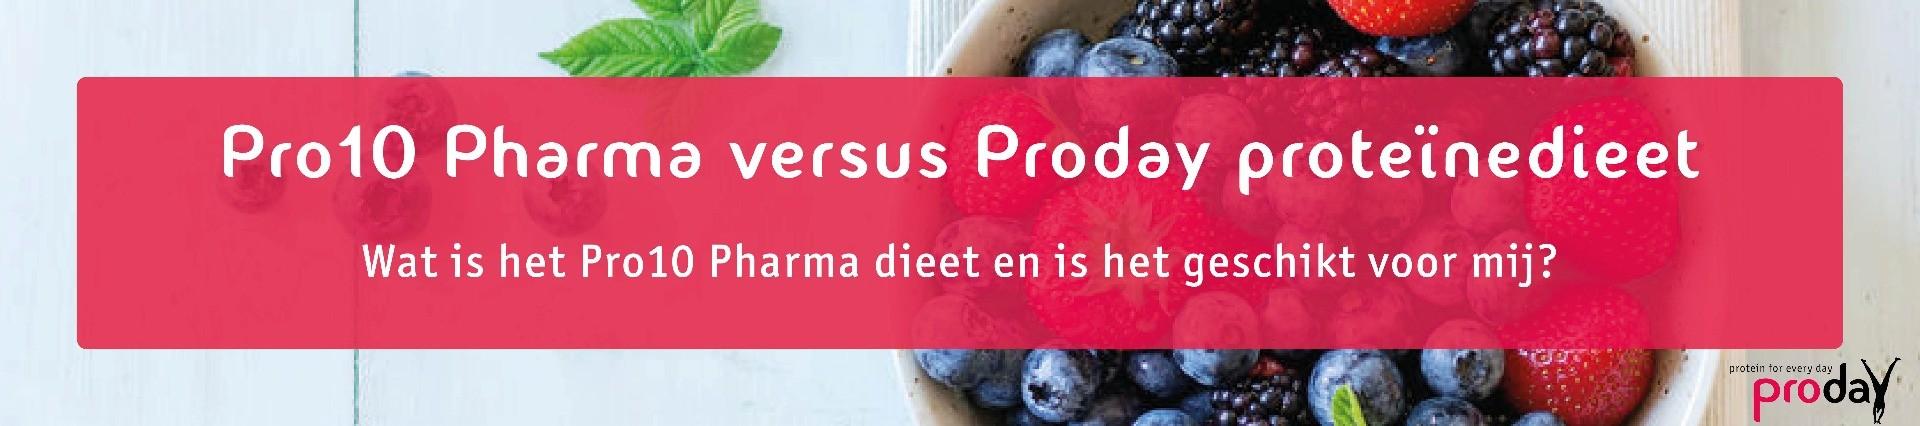 Pro10pharma proteinedieet